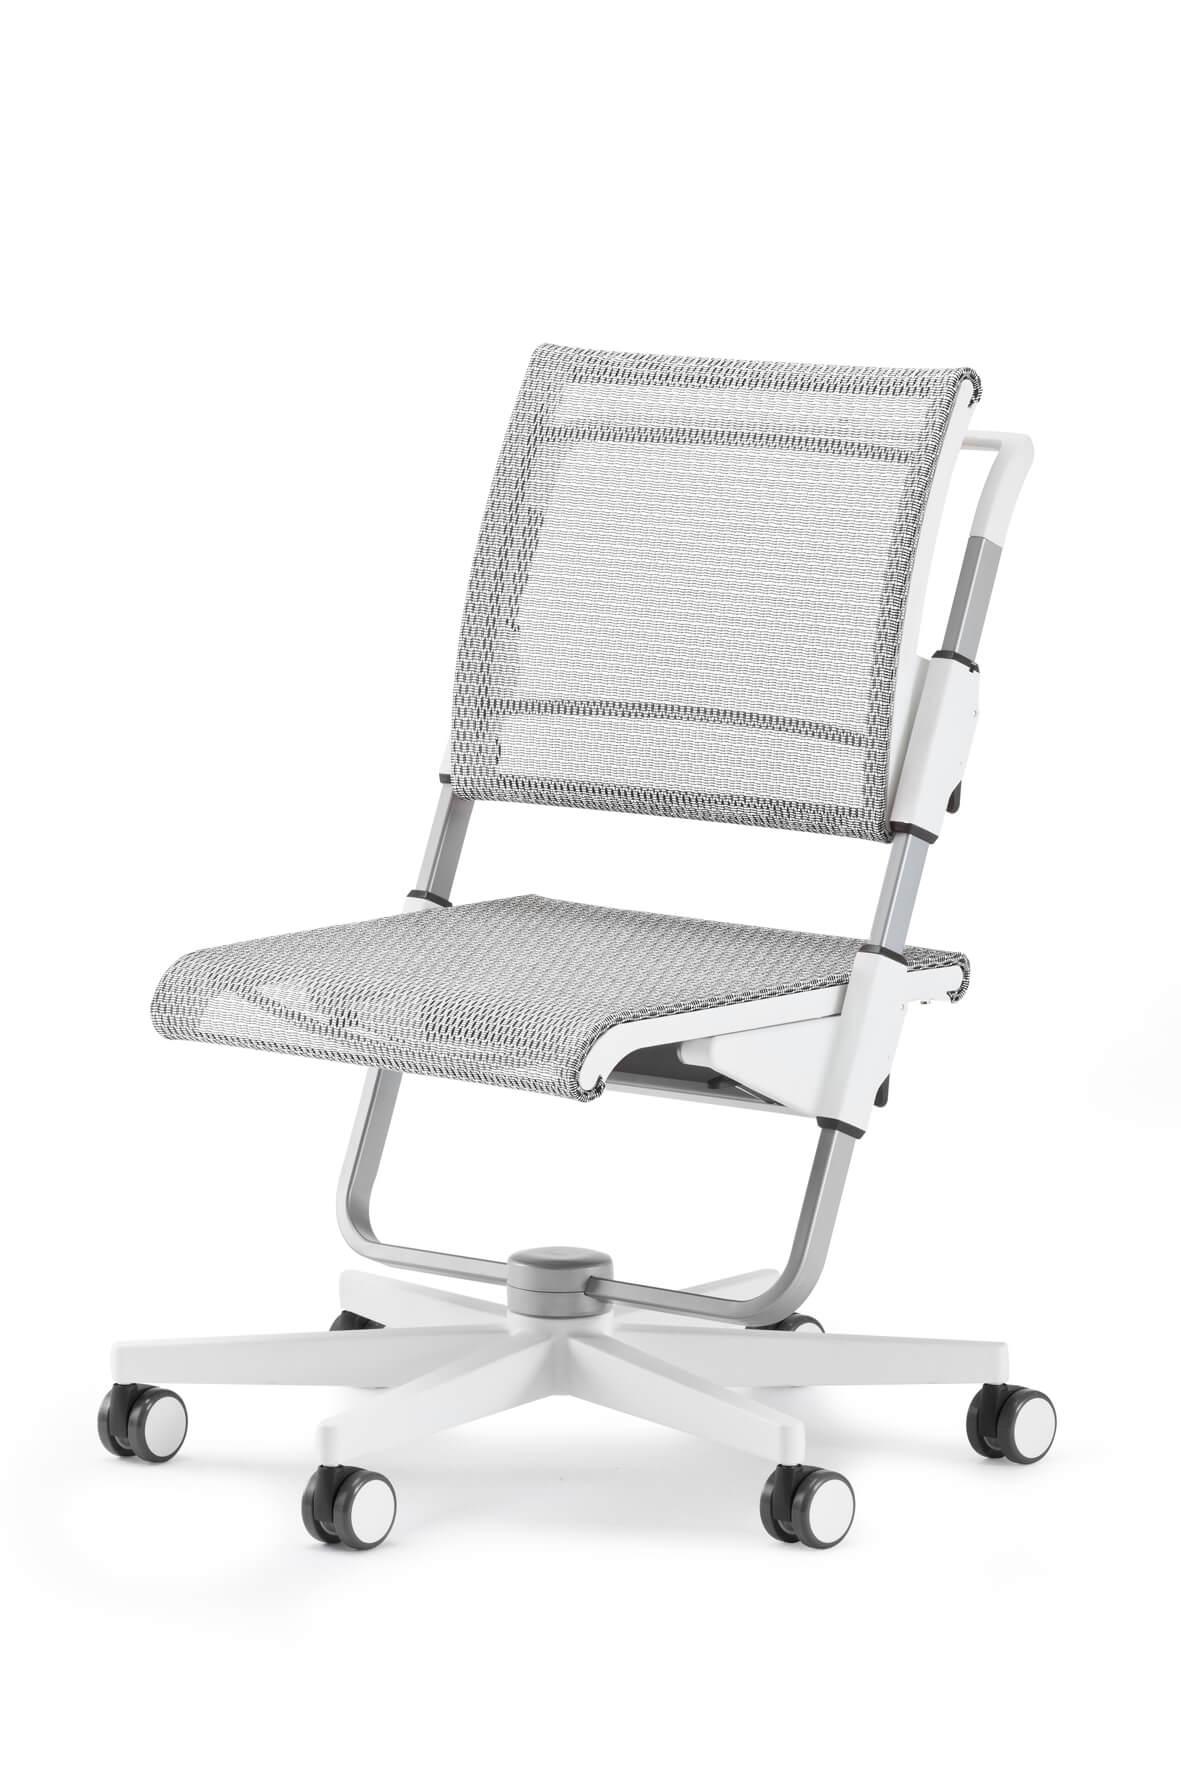 Регулируемый детский стул - moll SCOOTER 15